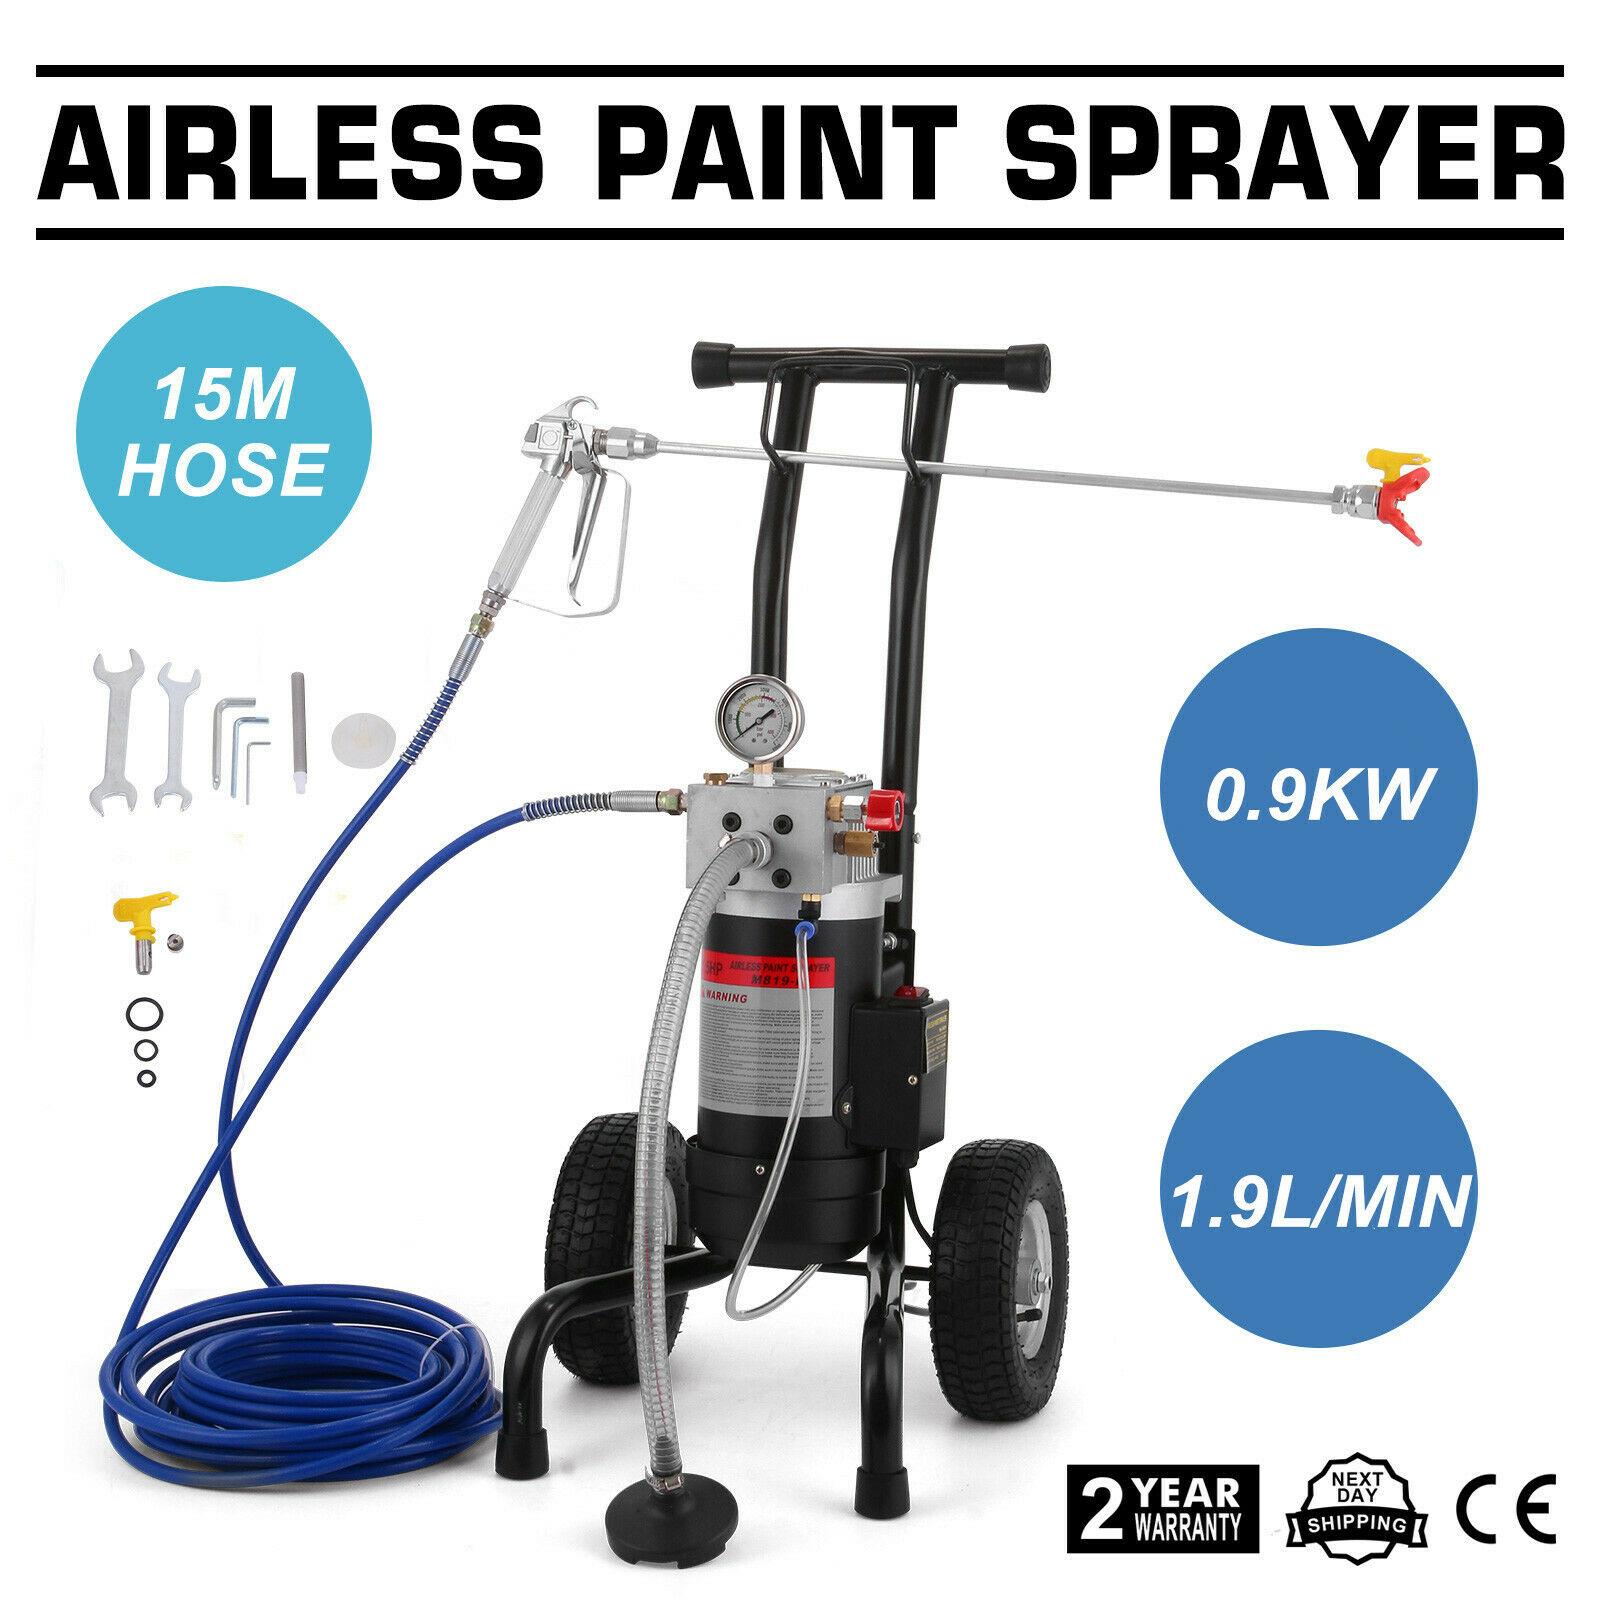 Paint sprayer all in one paint sprayer Airless M819 ABP paint sprayer 1.9L / MIN Garment Steamer Parts     - title=